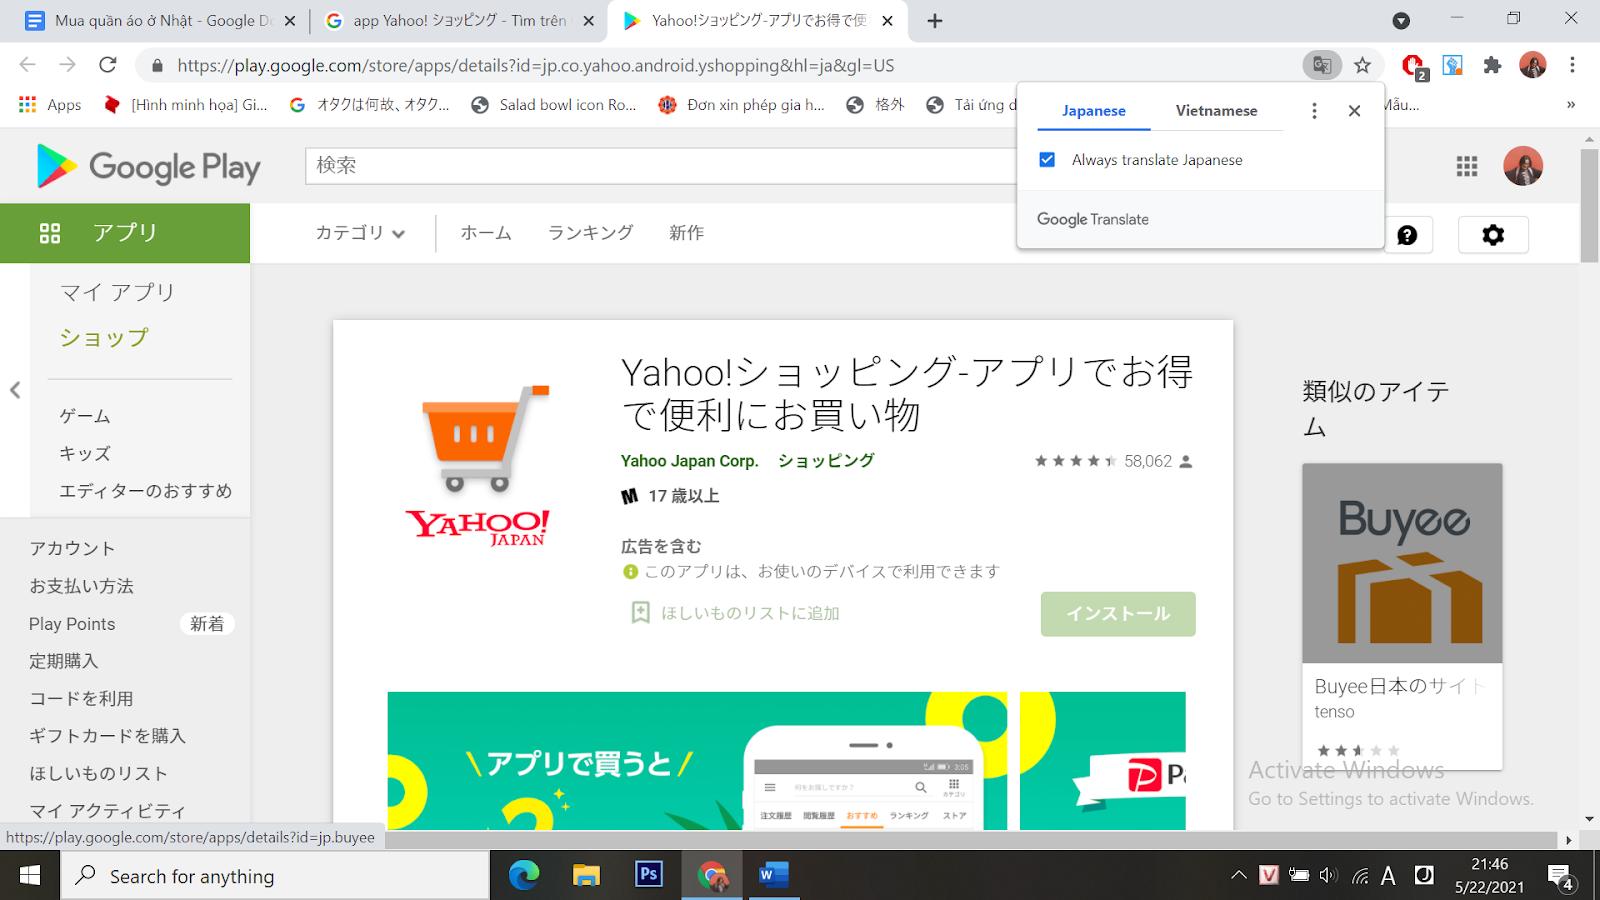 app Yahoo shopping